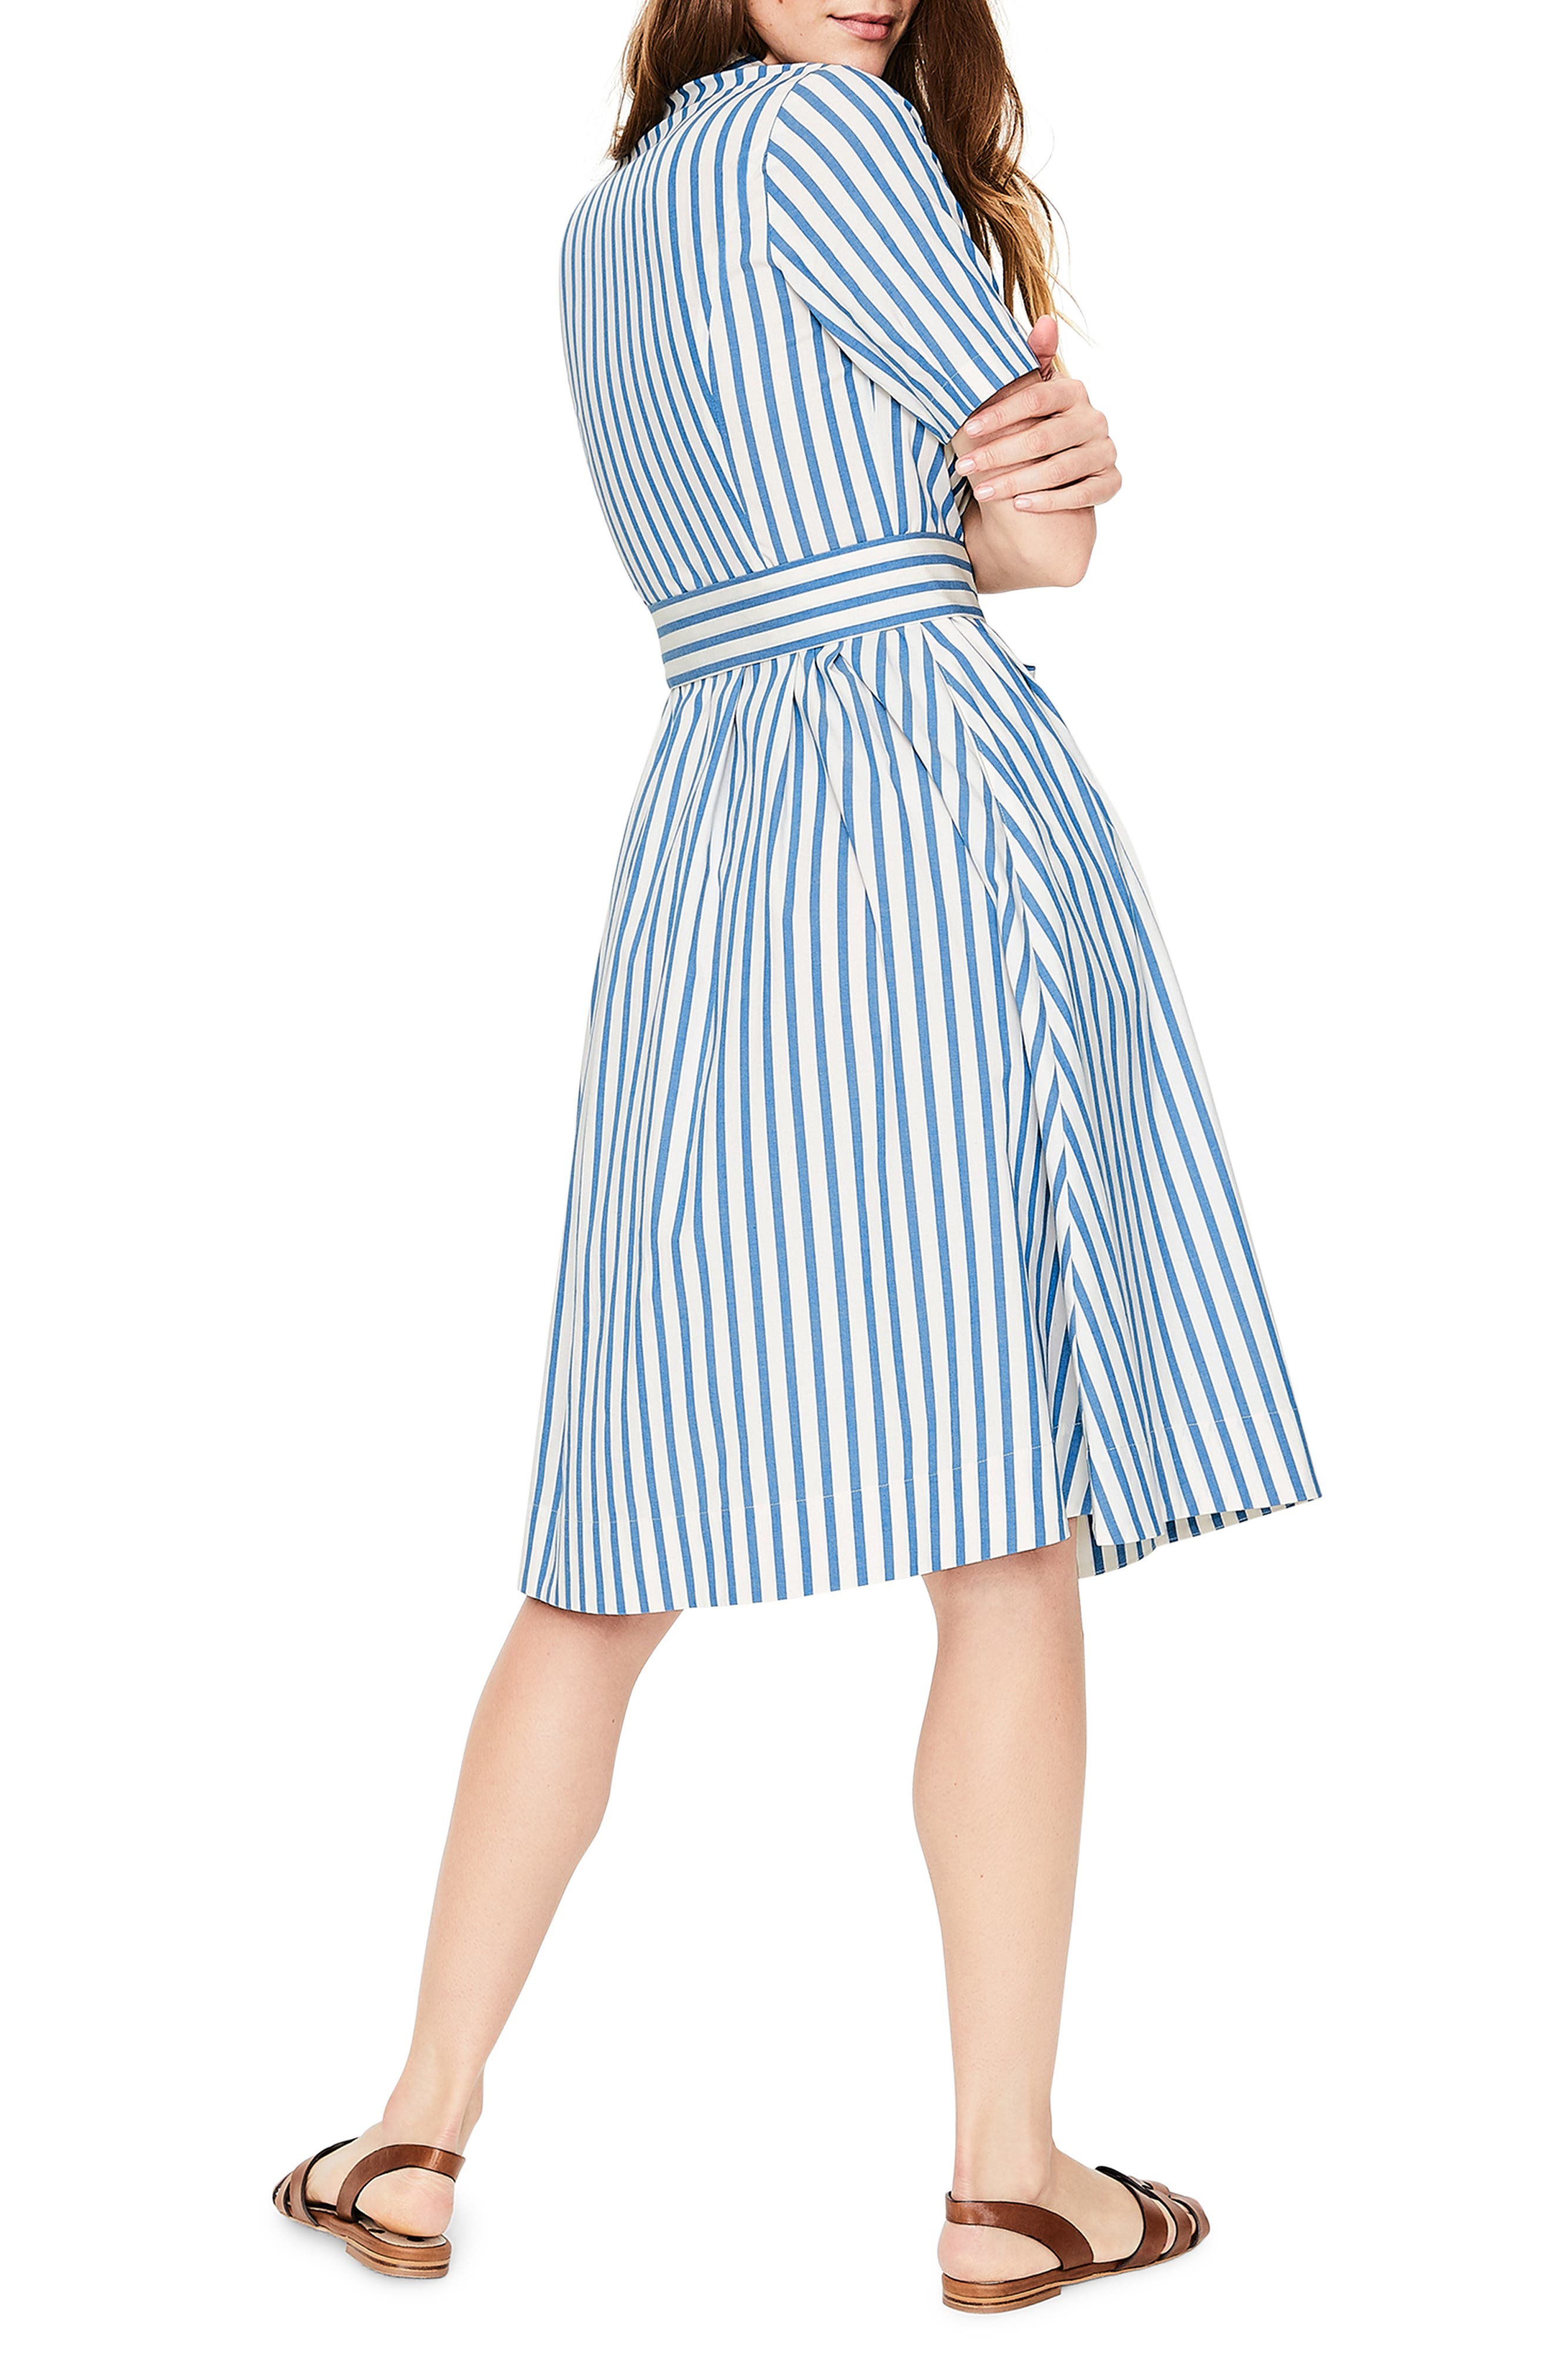 BODEN, Anastasia Tie Front Shirtdress, Alternate thumbnail 2, color, 454